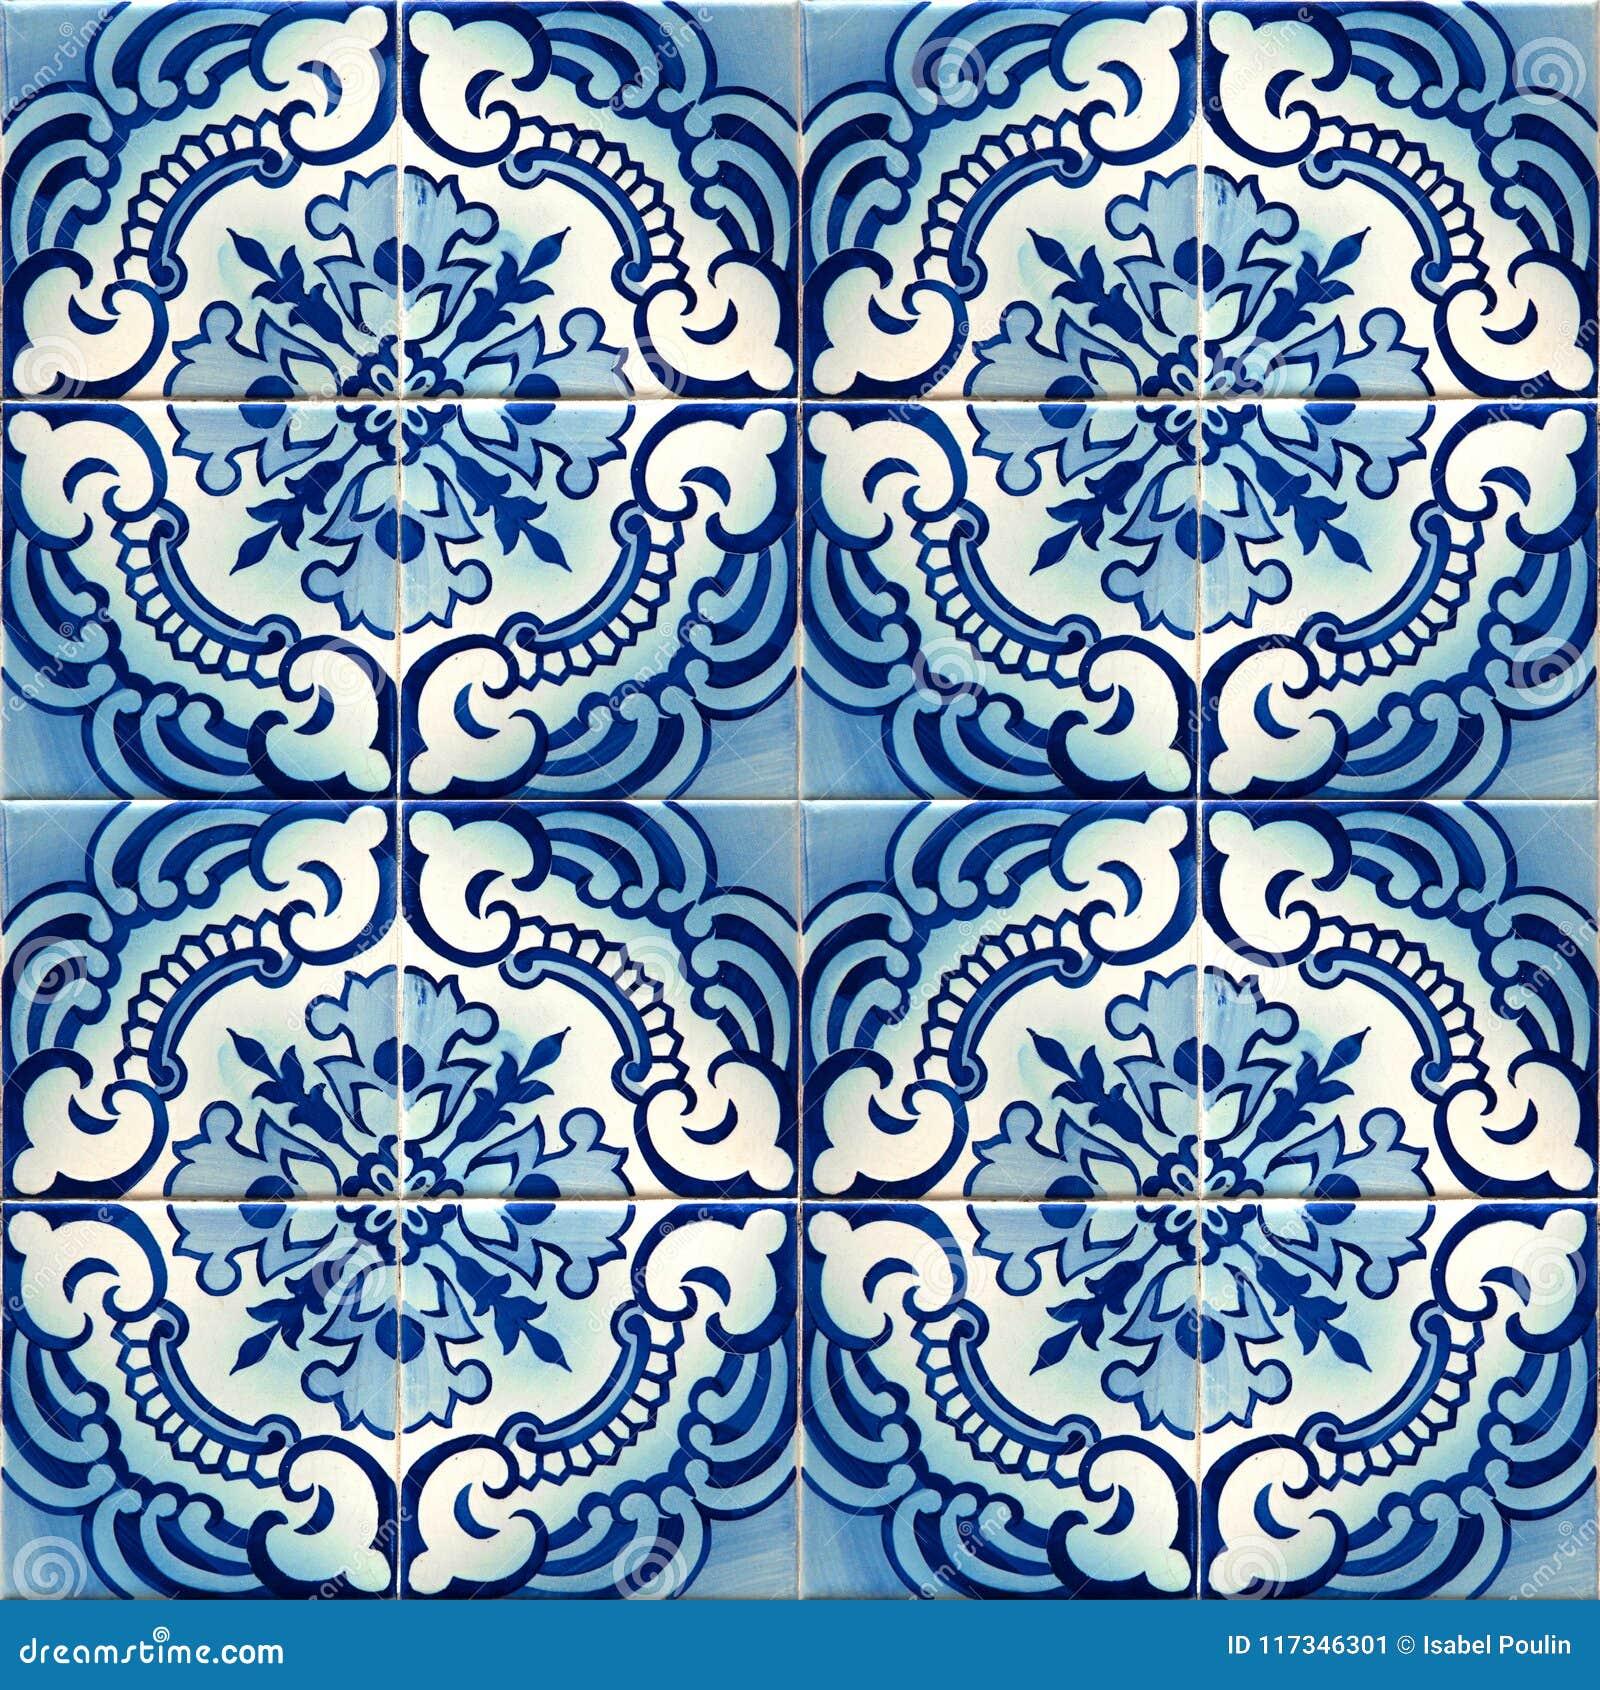 Collection Of Blue Patterns Tiles Stock Illustration - Illustration ...